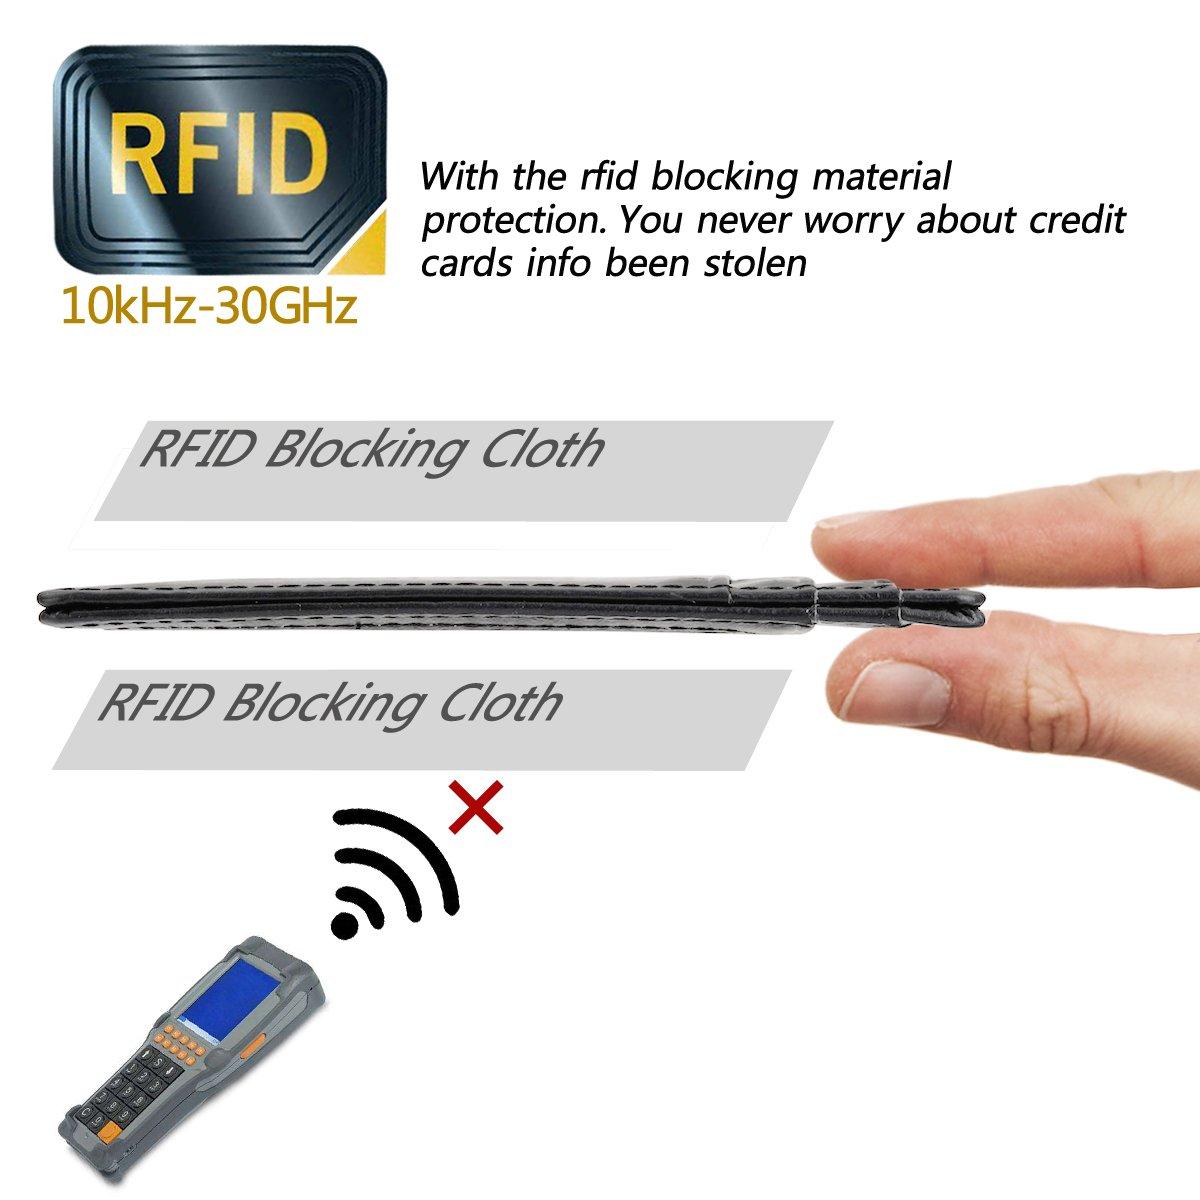 GH GOLD HORSE Slim RFID Blocking Card Holder Minimalist Leather Front Pocket Wallet for Women (Black) by GH GOLD HORSE (Image #4)